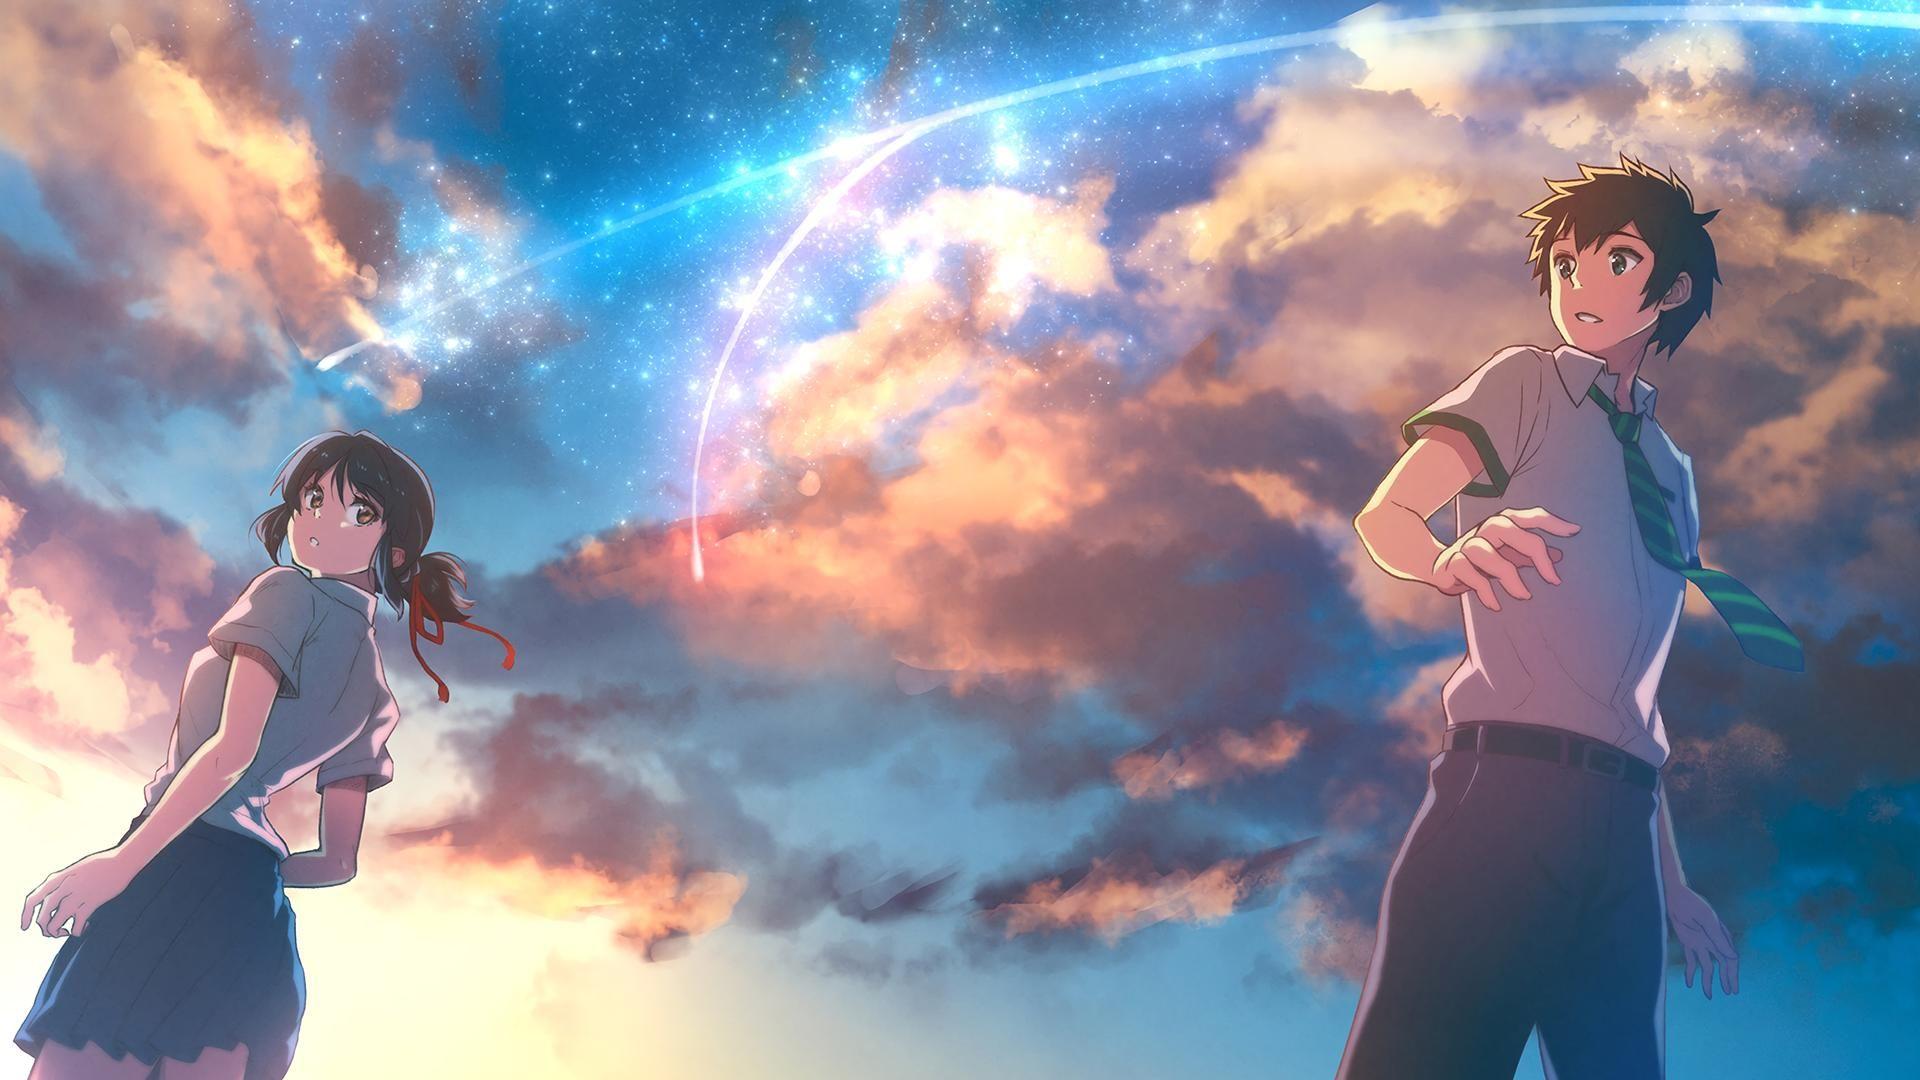 Kimi no Na Wa HD Wallpaper From Gallsource.com | Animasi ...